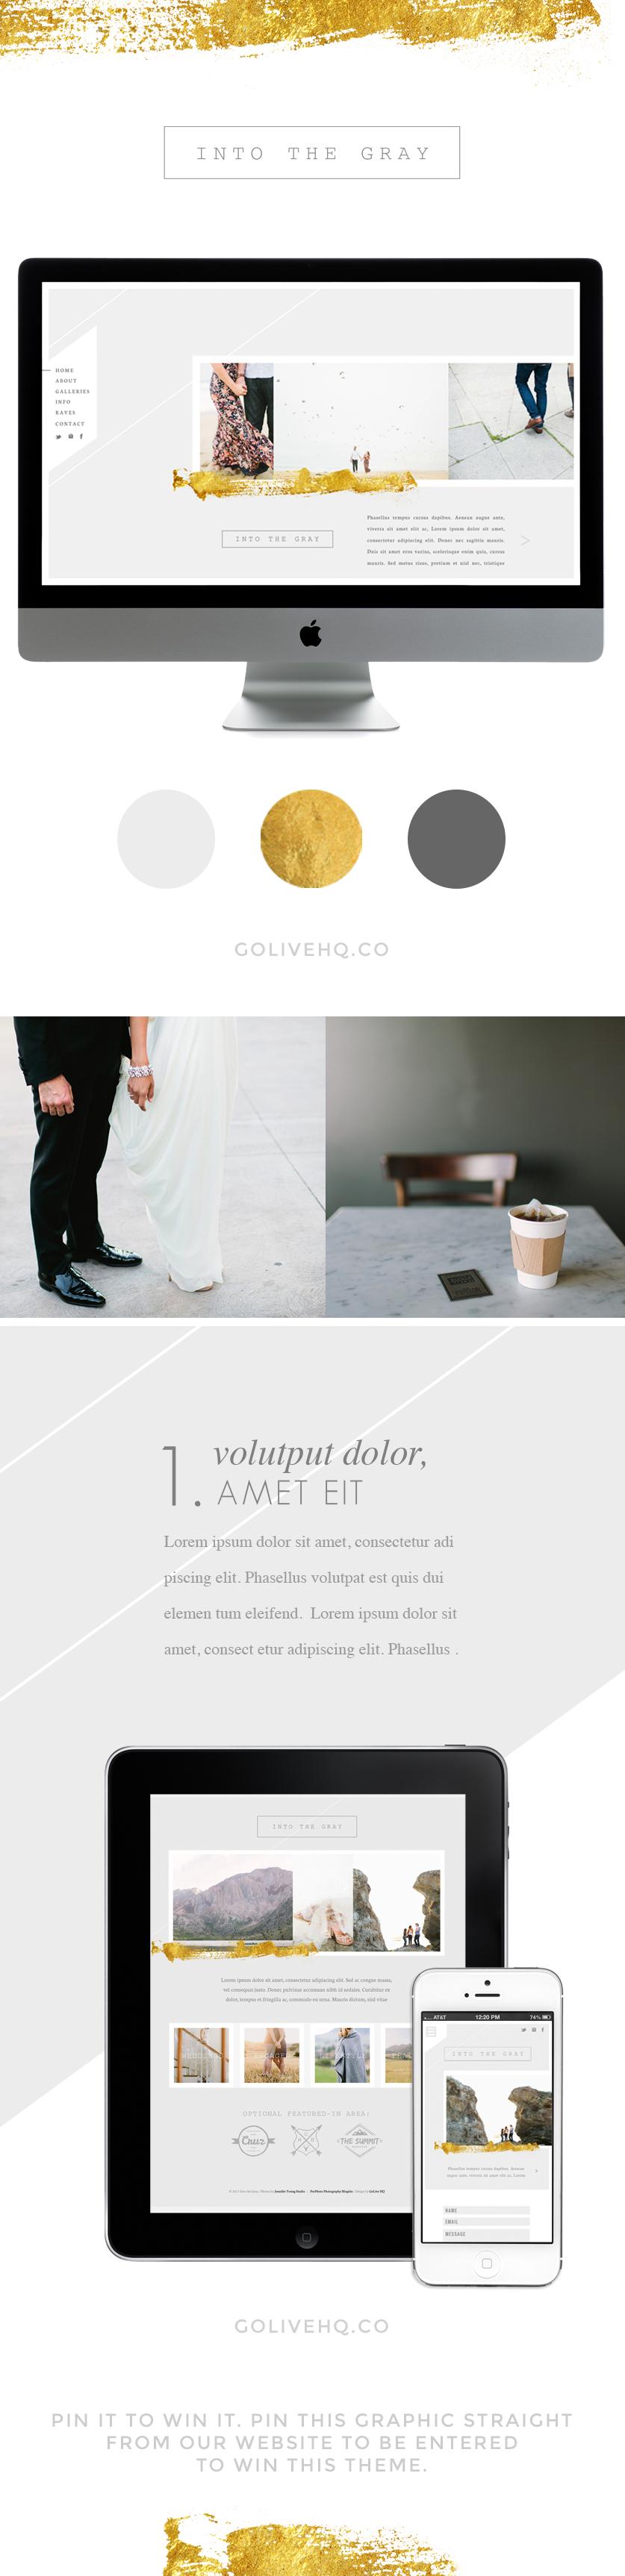 modern website theme - golivehq.co